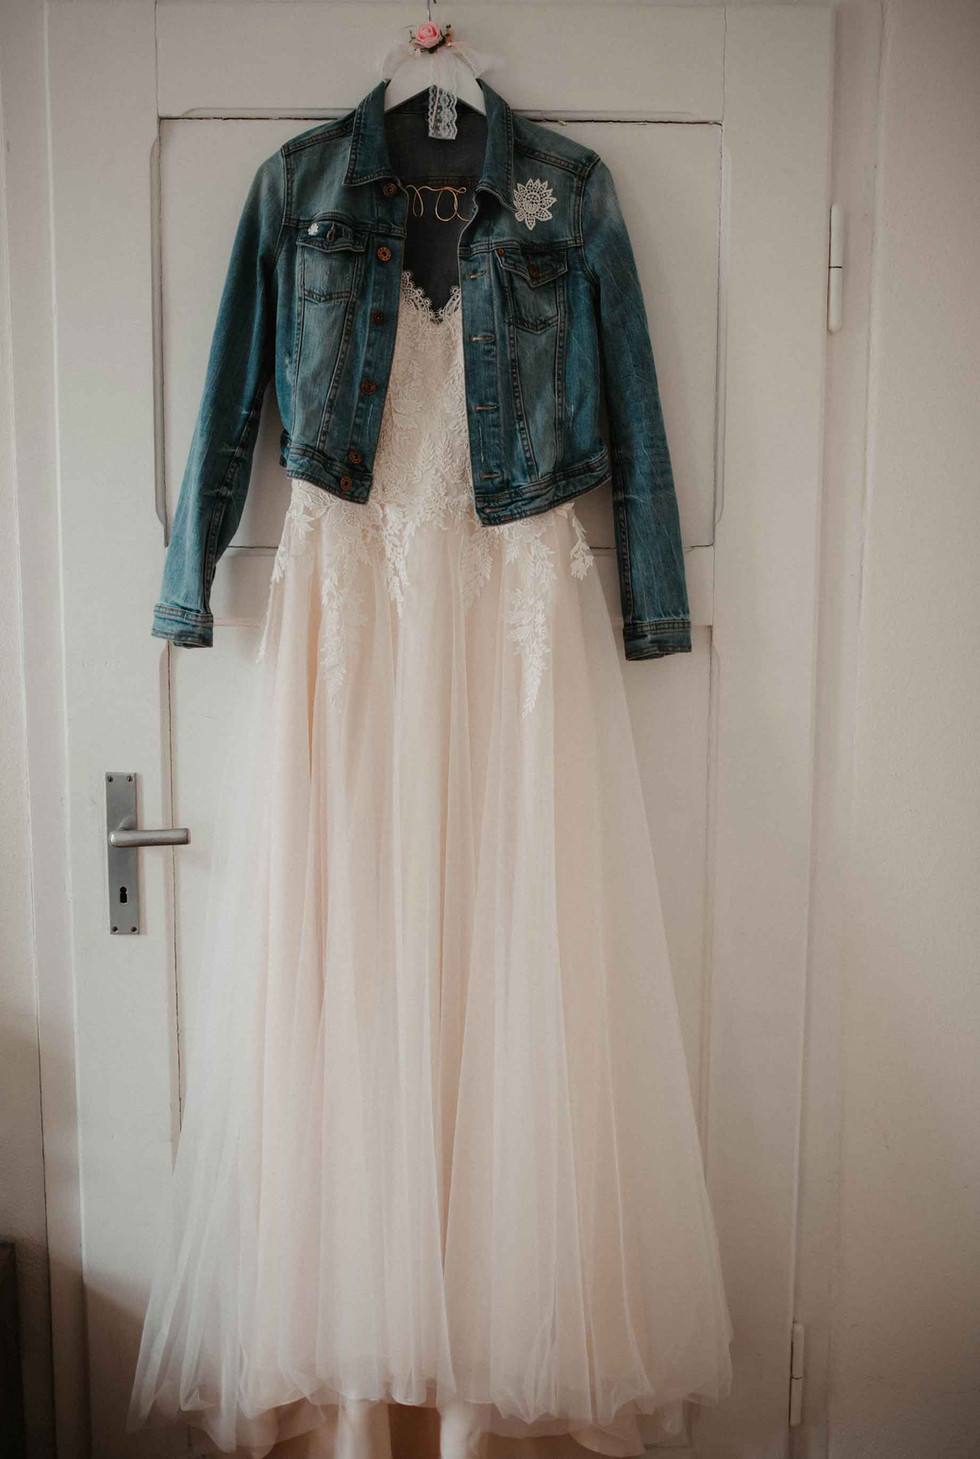 Brautkleid.Jeansjacke.jpg